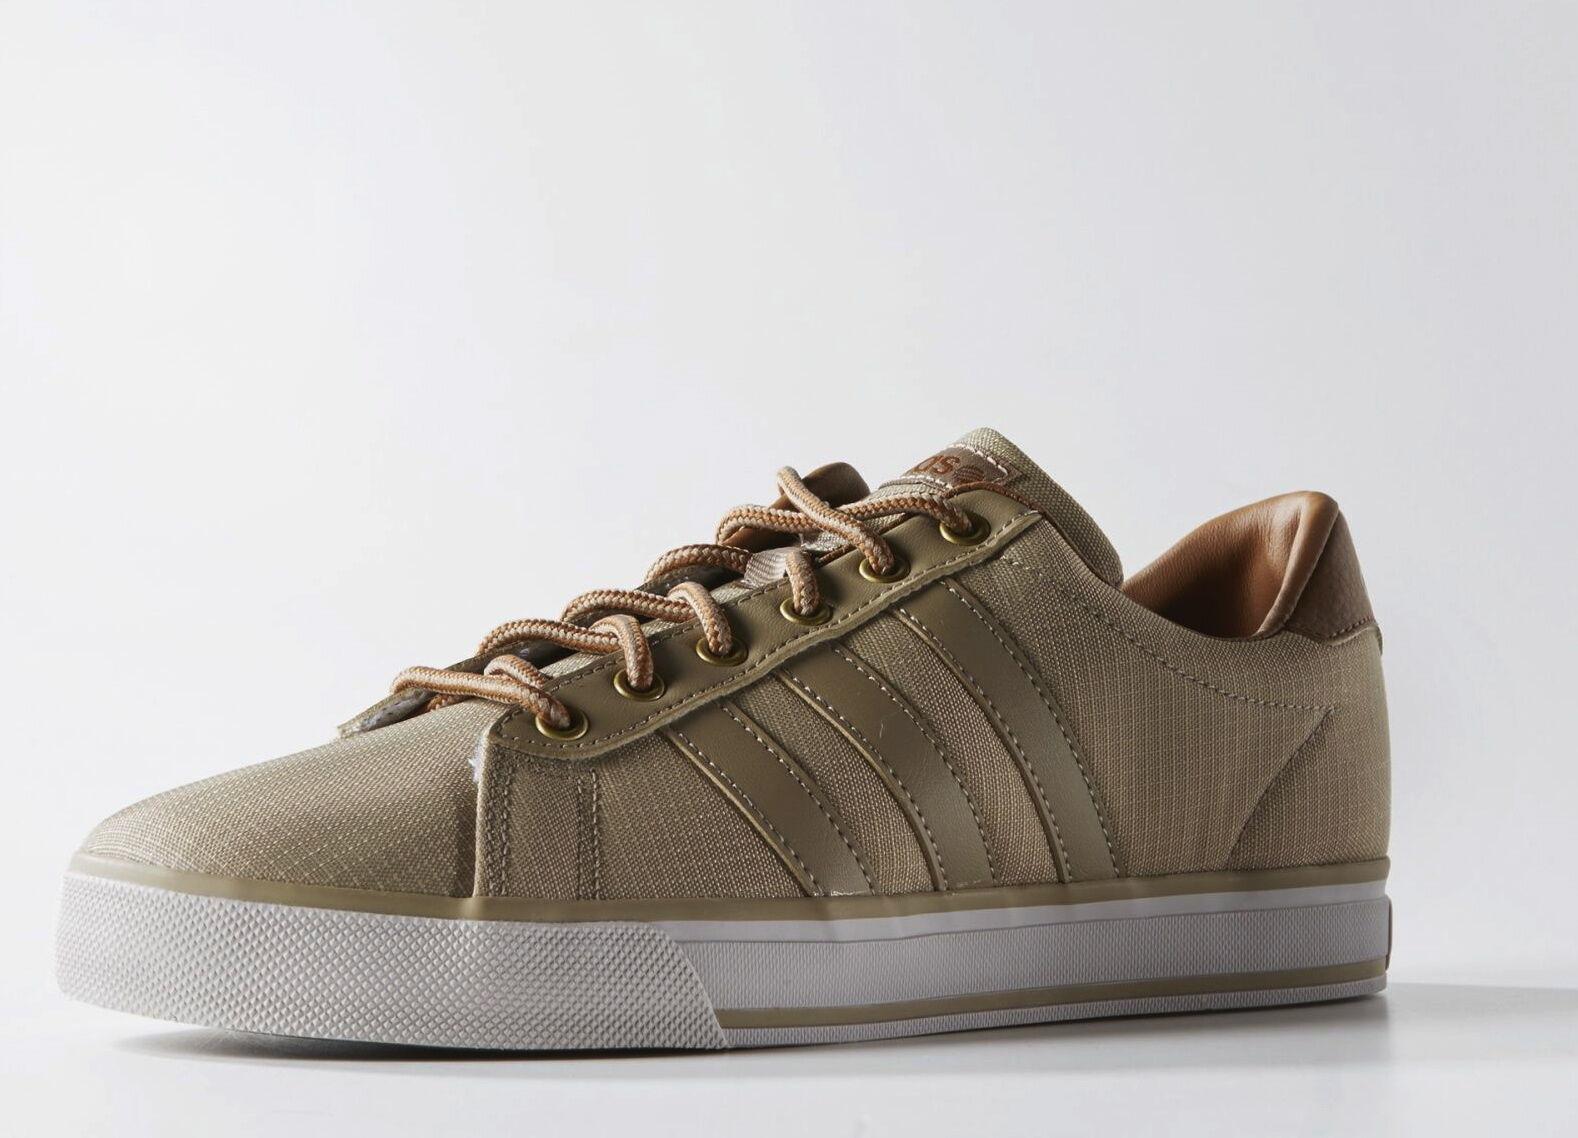 Herren Sport Schuhe * ADIDAS NEO DAILY  *Brown * LAST ONE